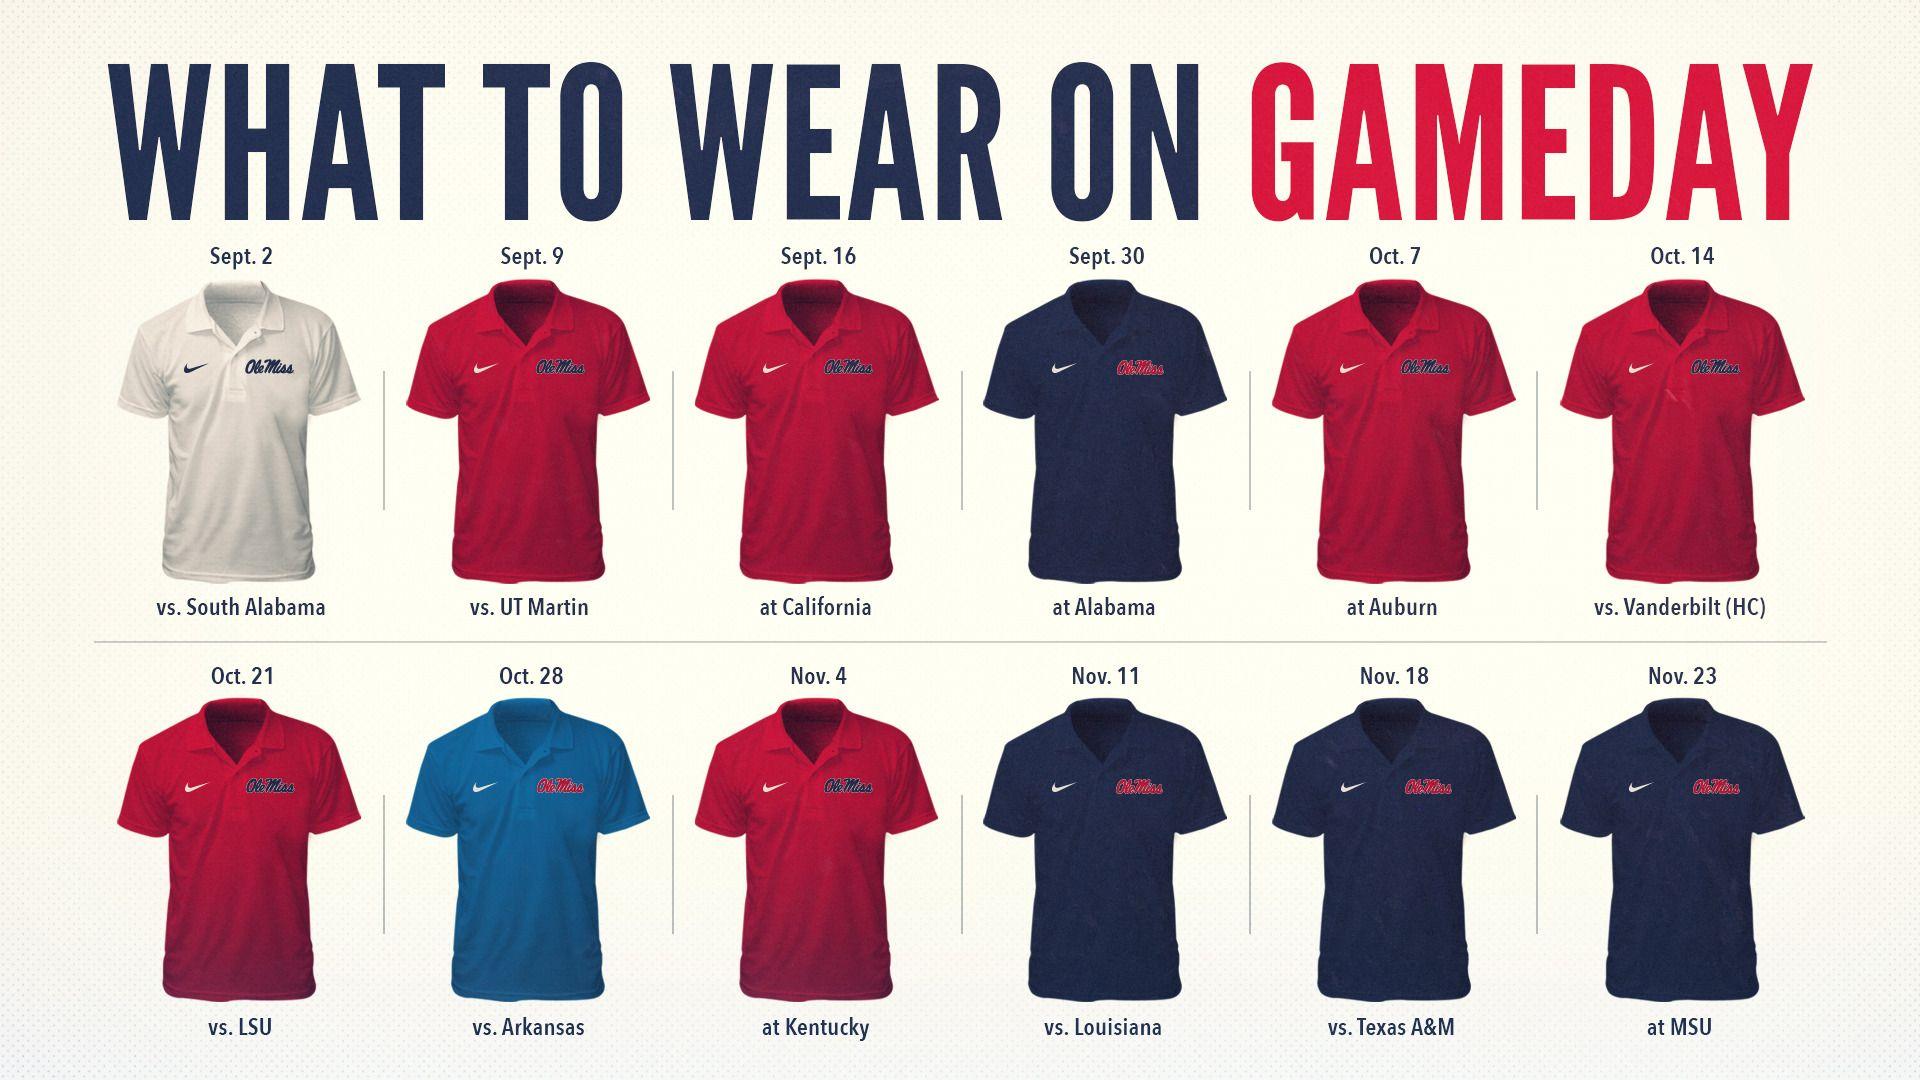 What to Wear Ole miss, Alabama vs, Ole miss football